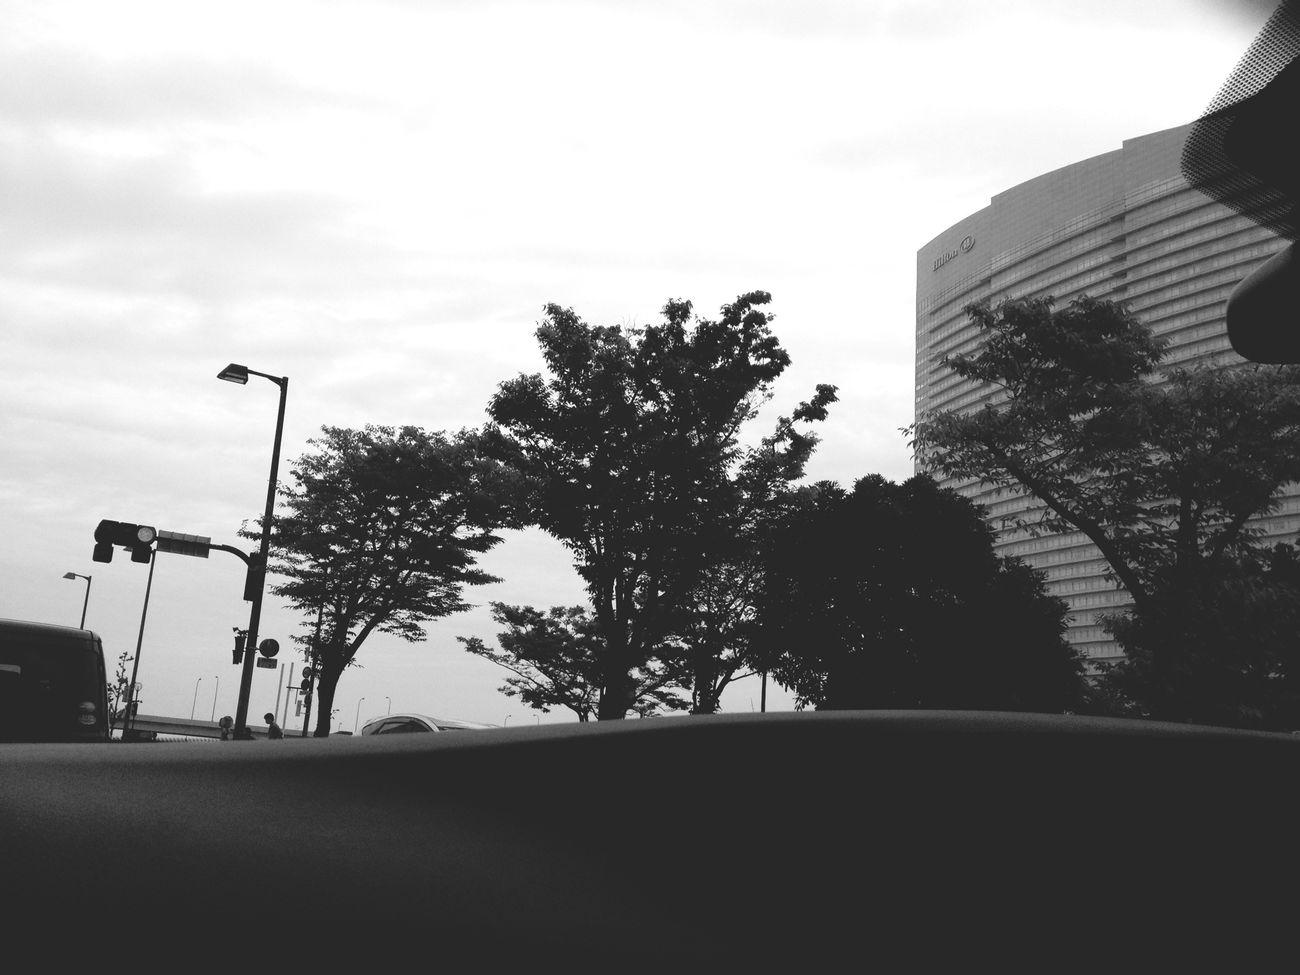 Hiltonhotel Monochrome Driving Fukuoka